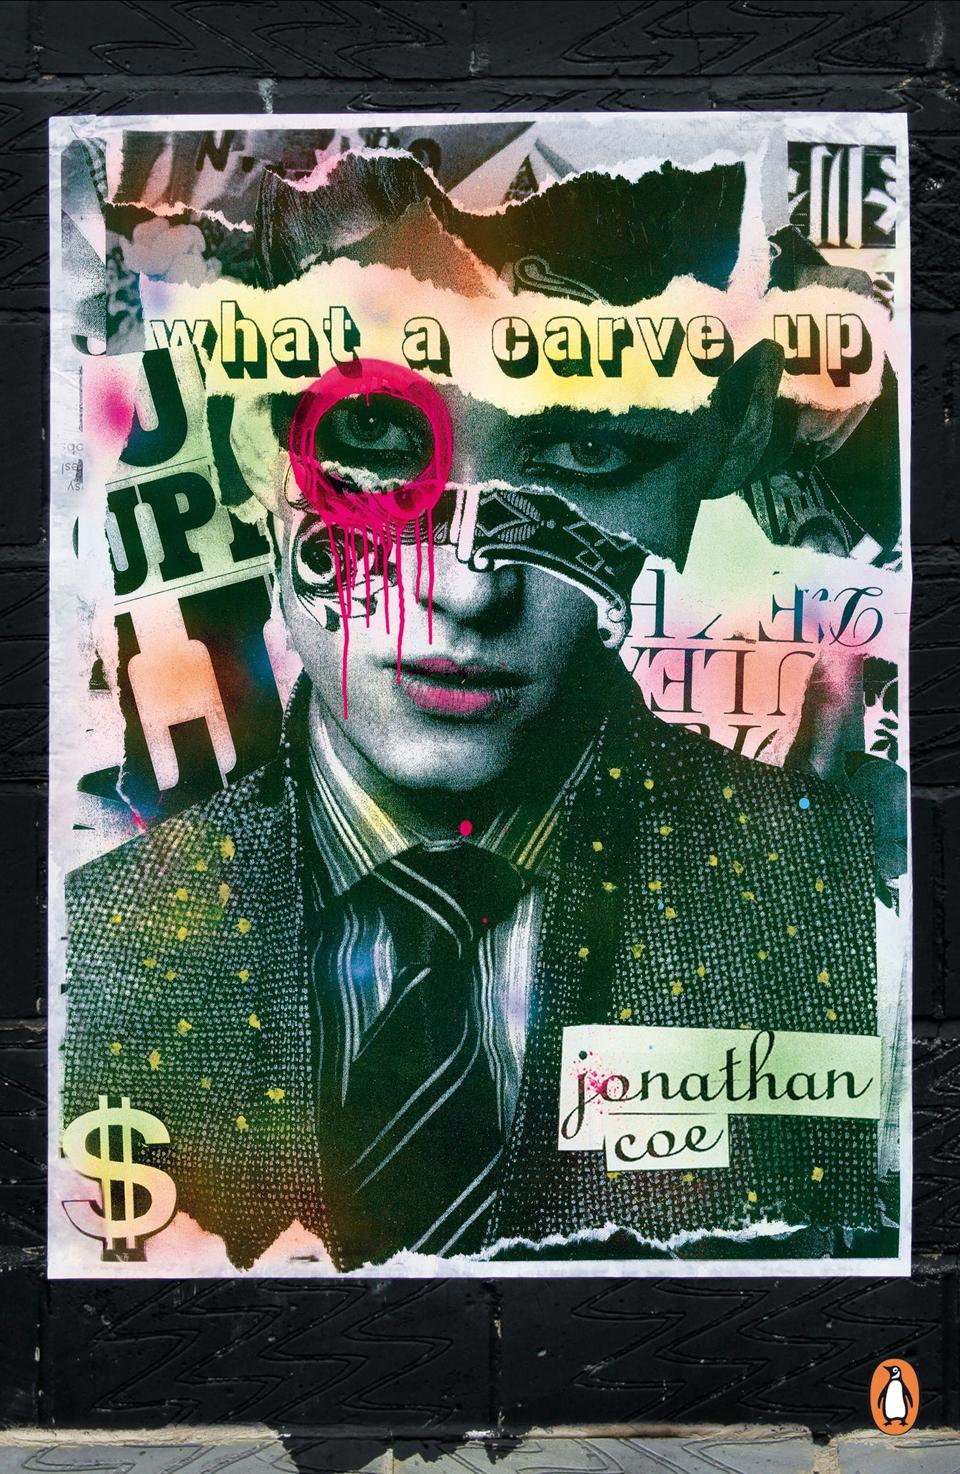 What a Carve Up! (Jonathan Coe) - Artista: Dain